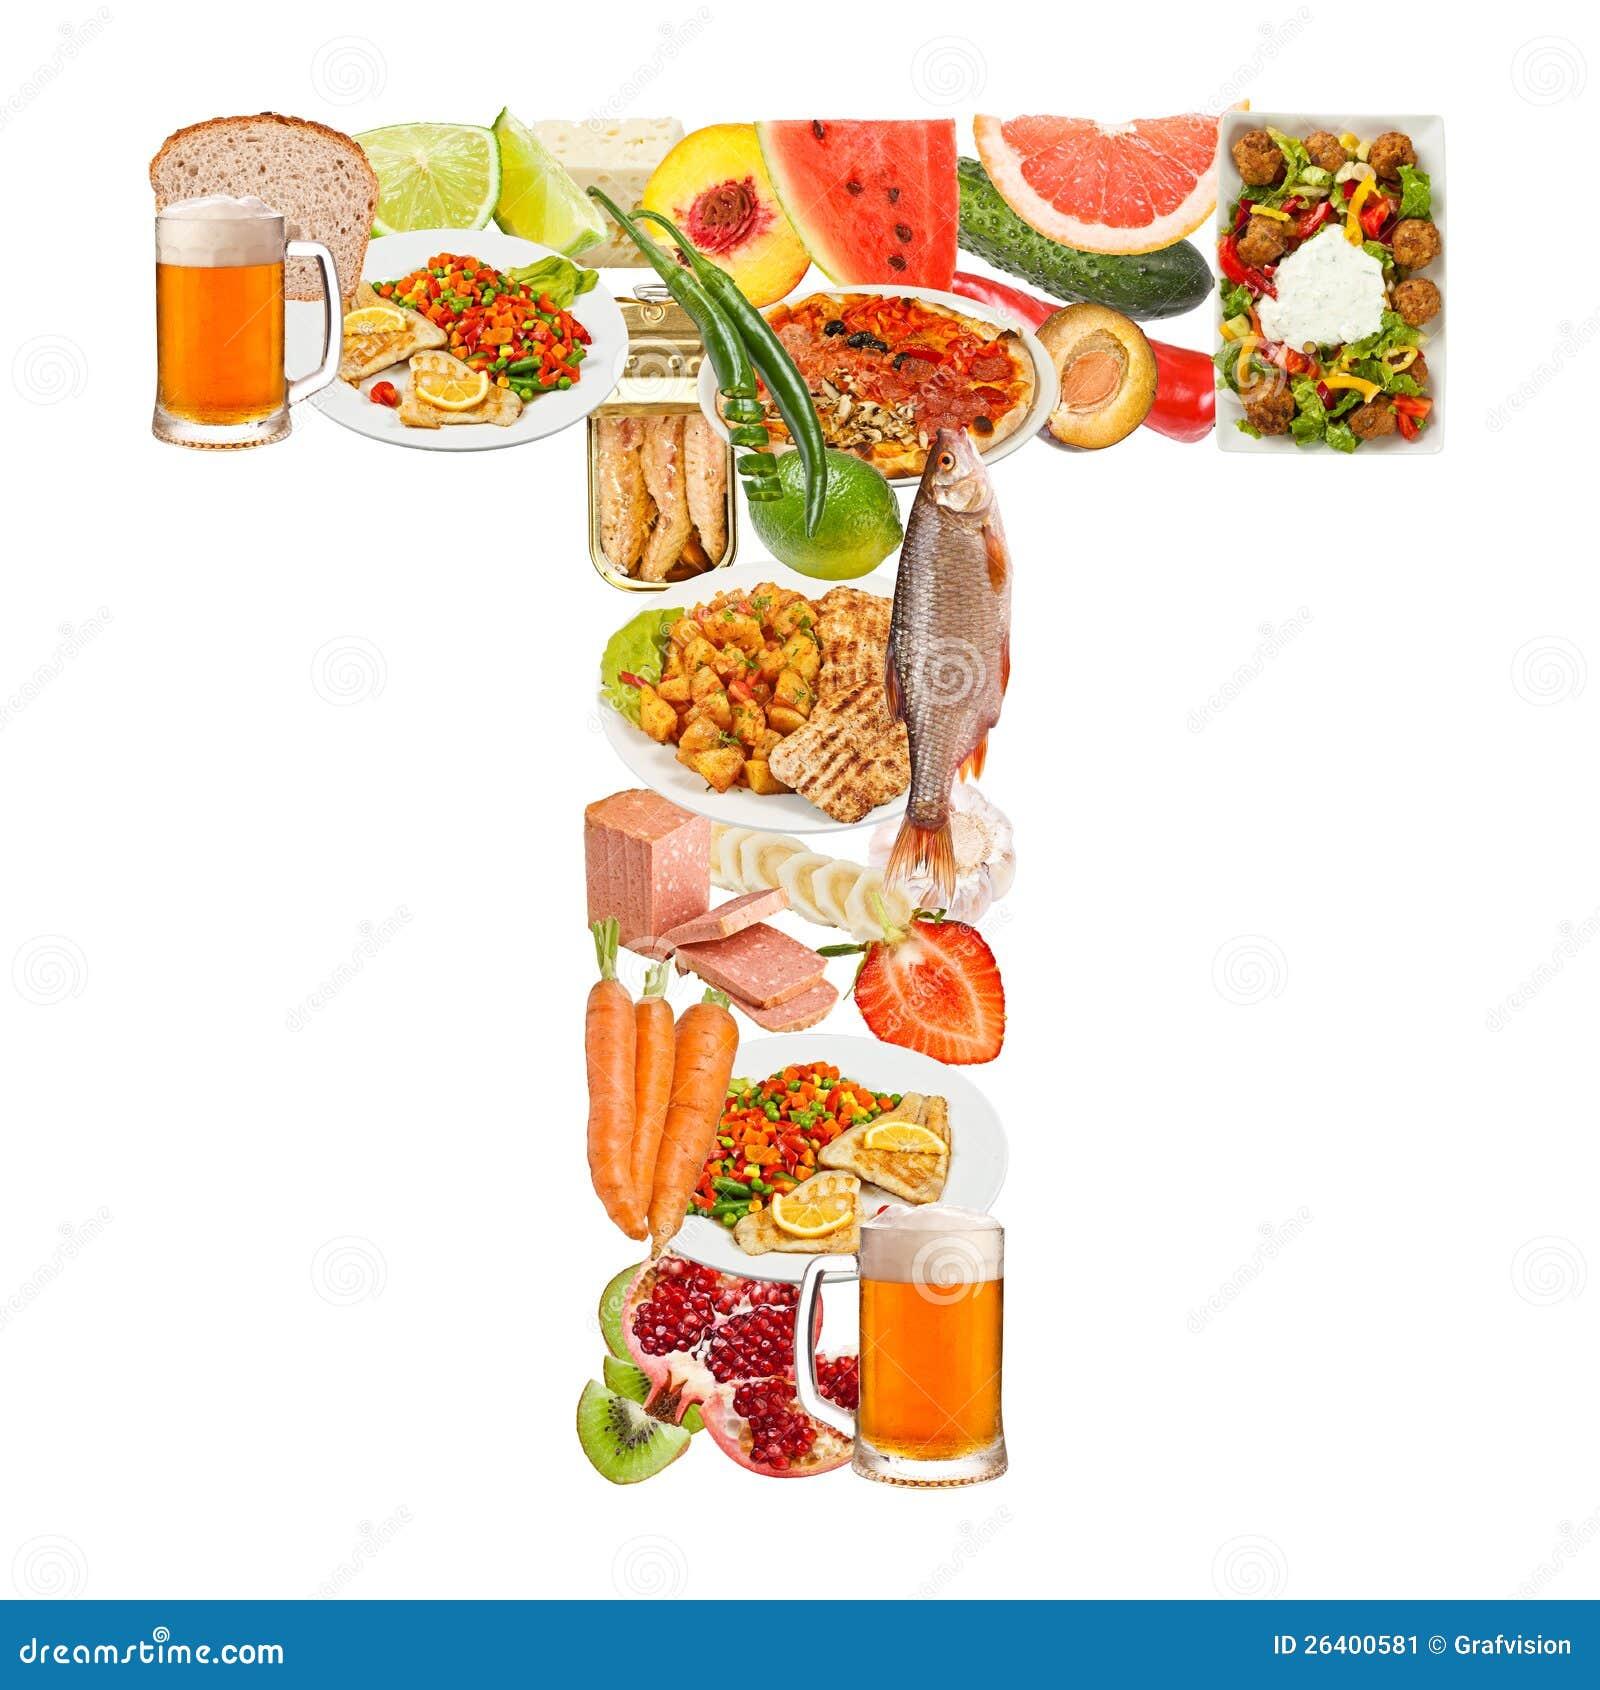 Free Printable Food Web